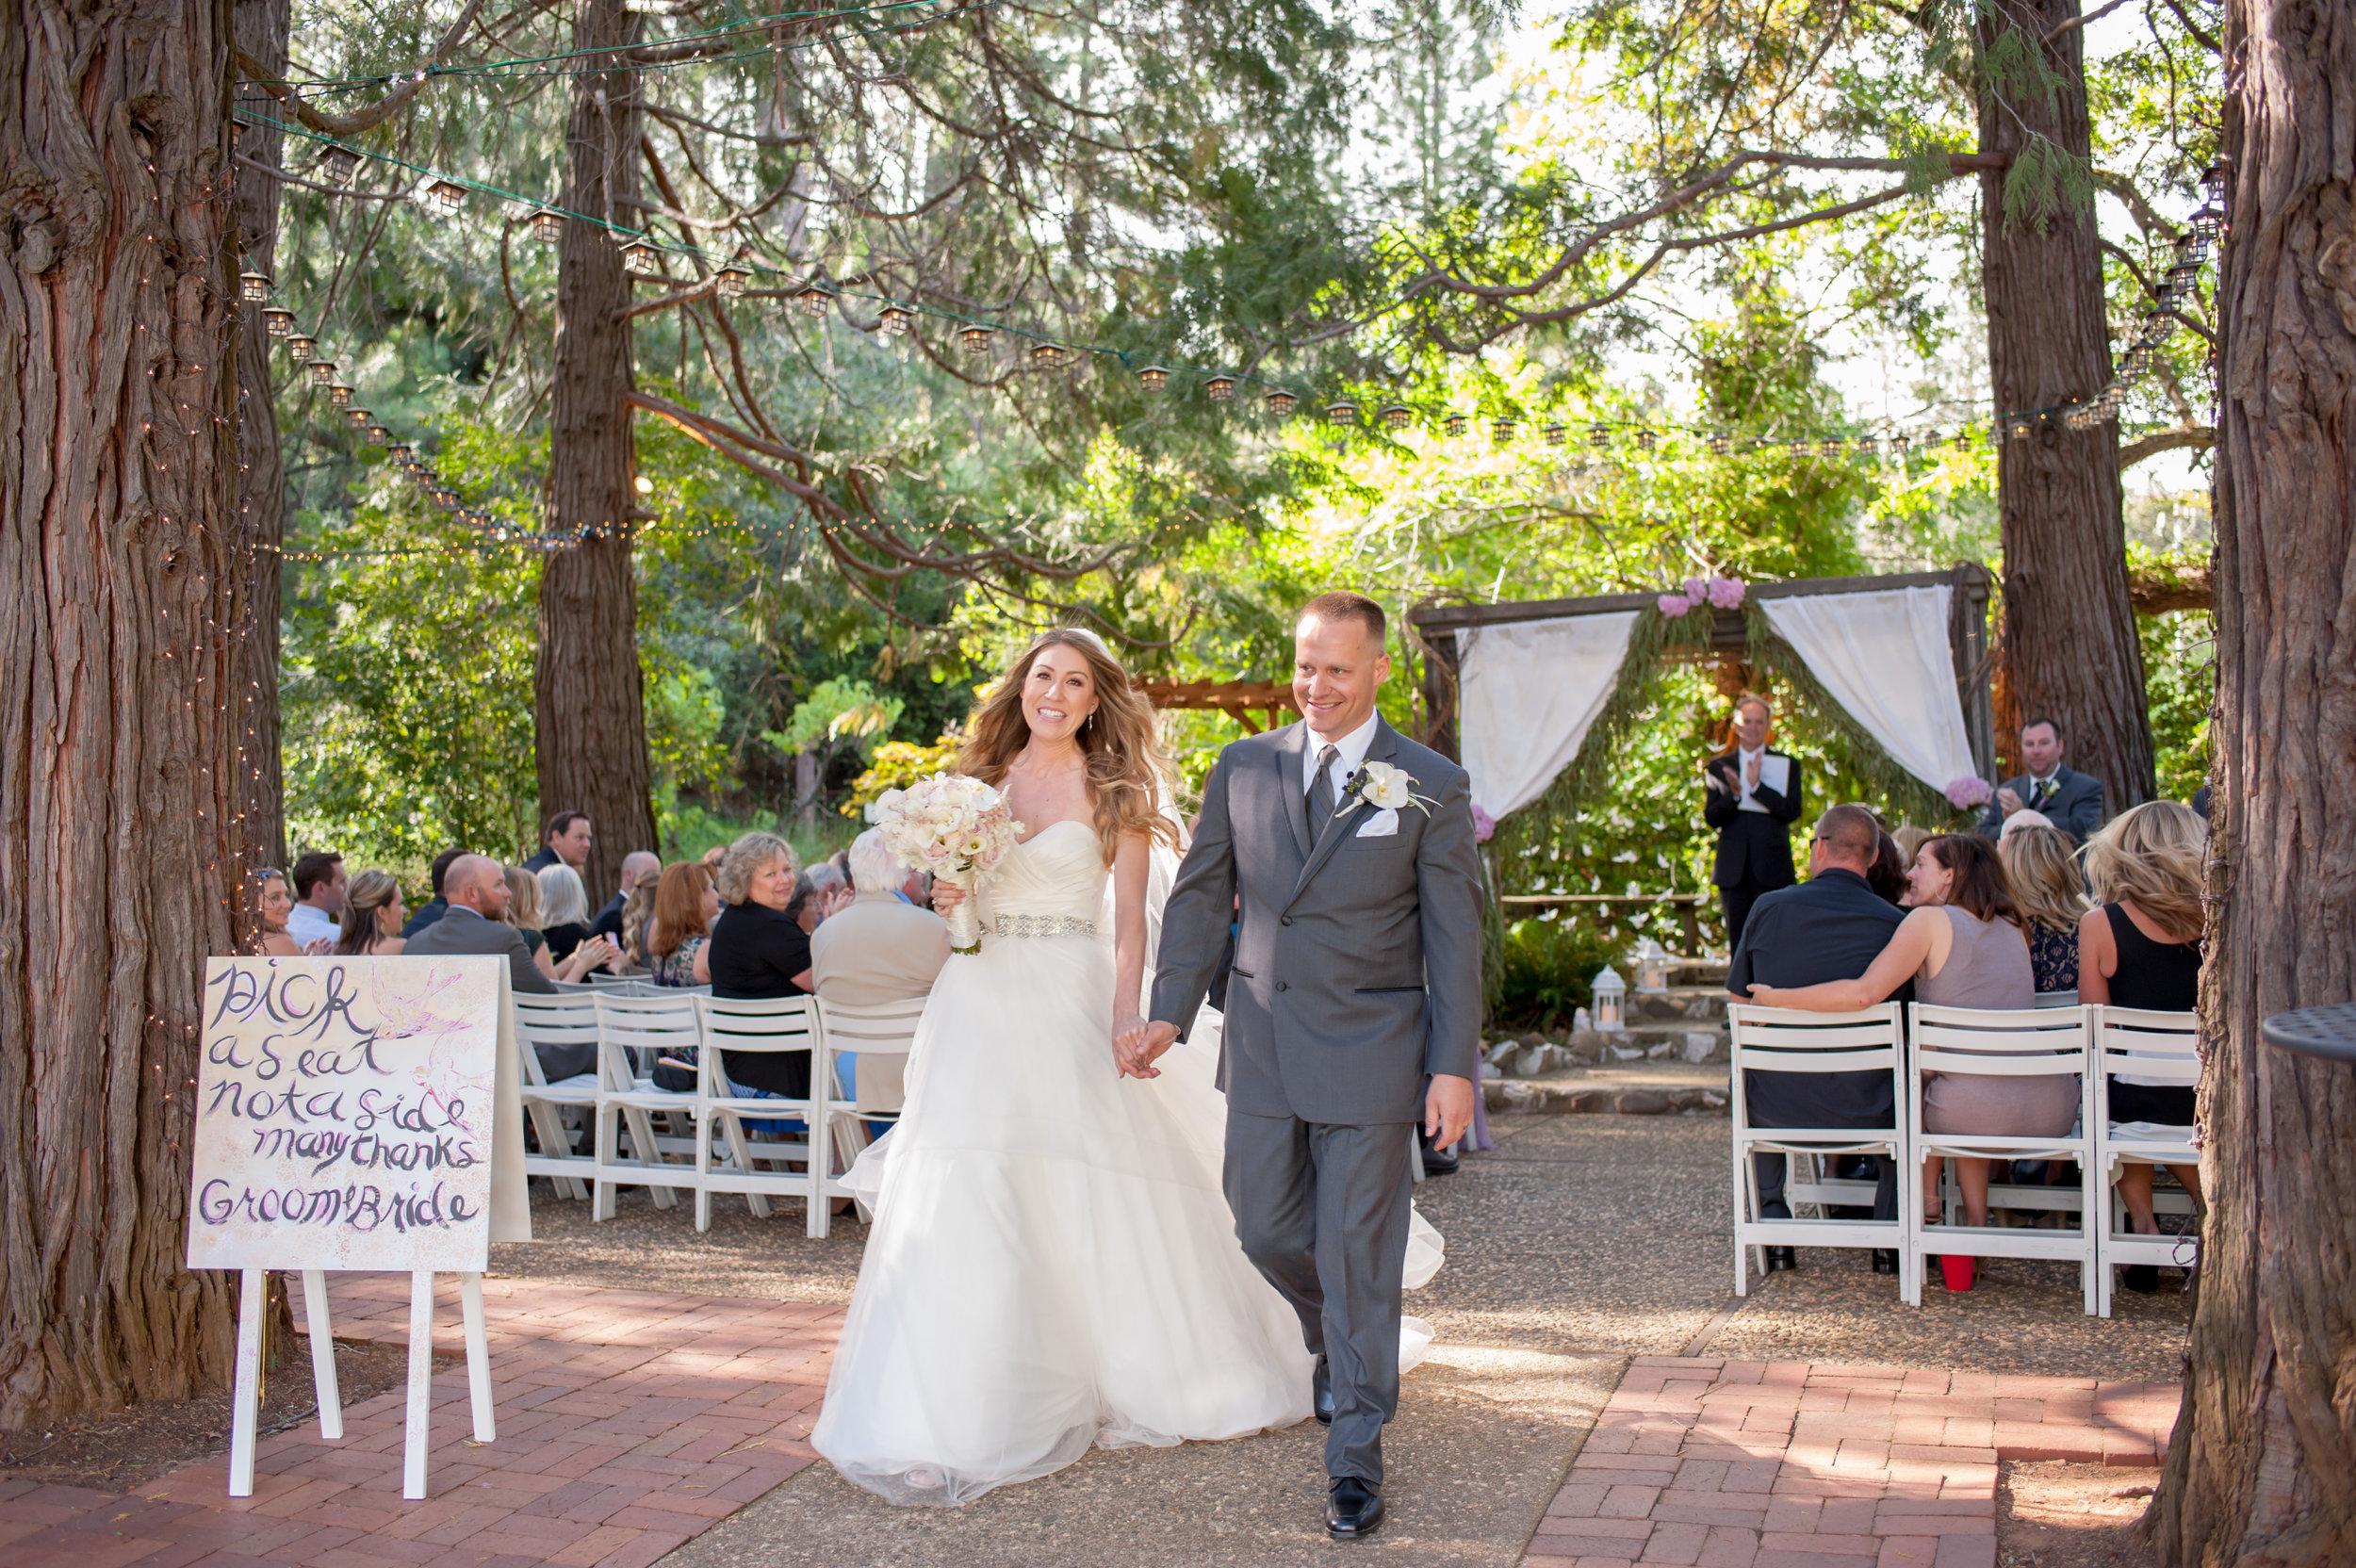 nicole-luke-025-onte-verde-inn-foresthill-wedding-photographer-katherine-nicole-photography.JPG